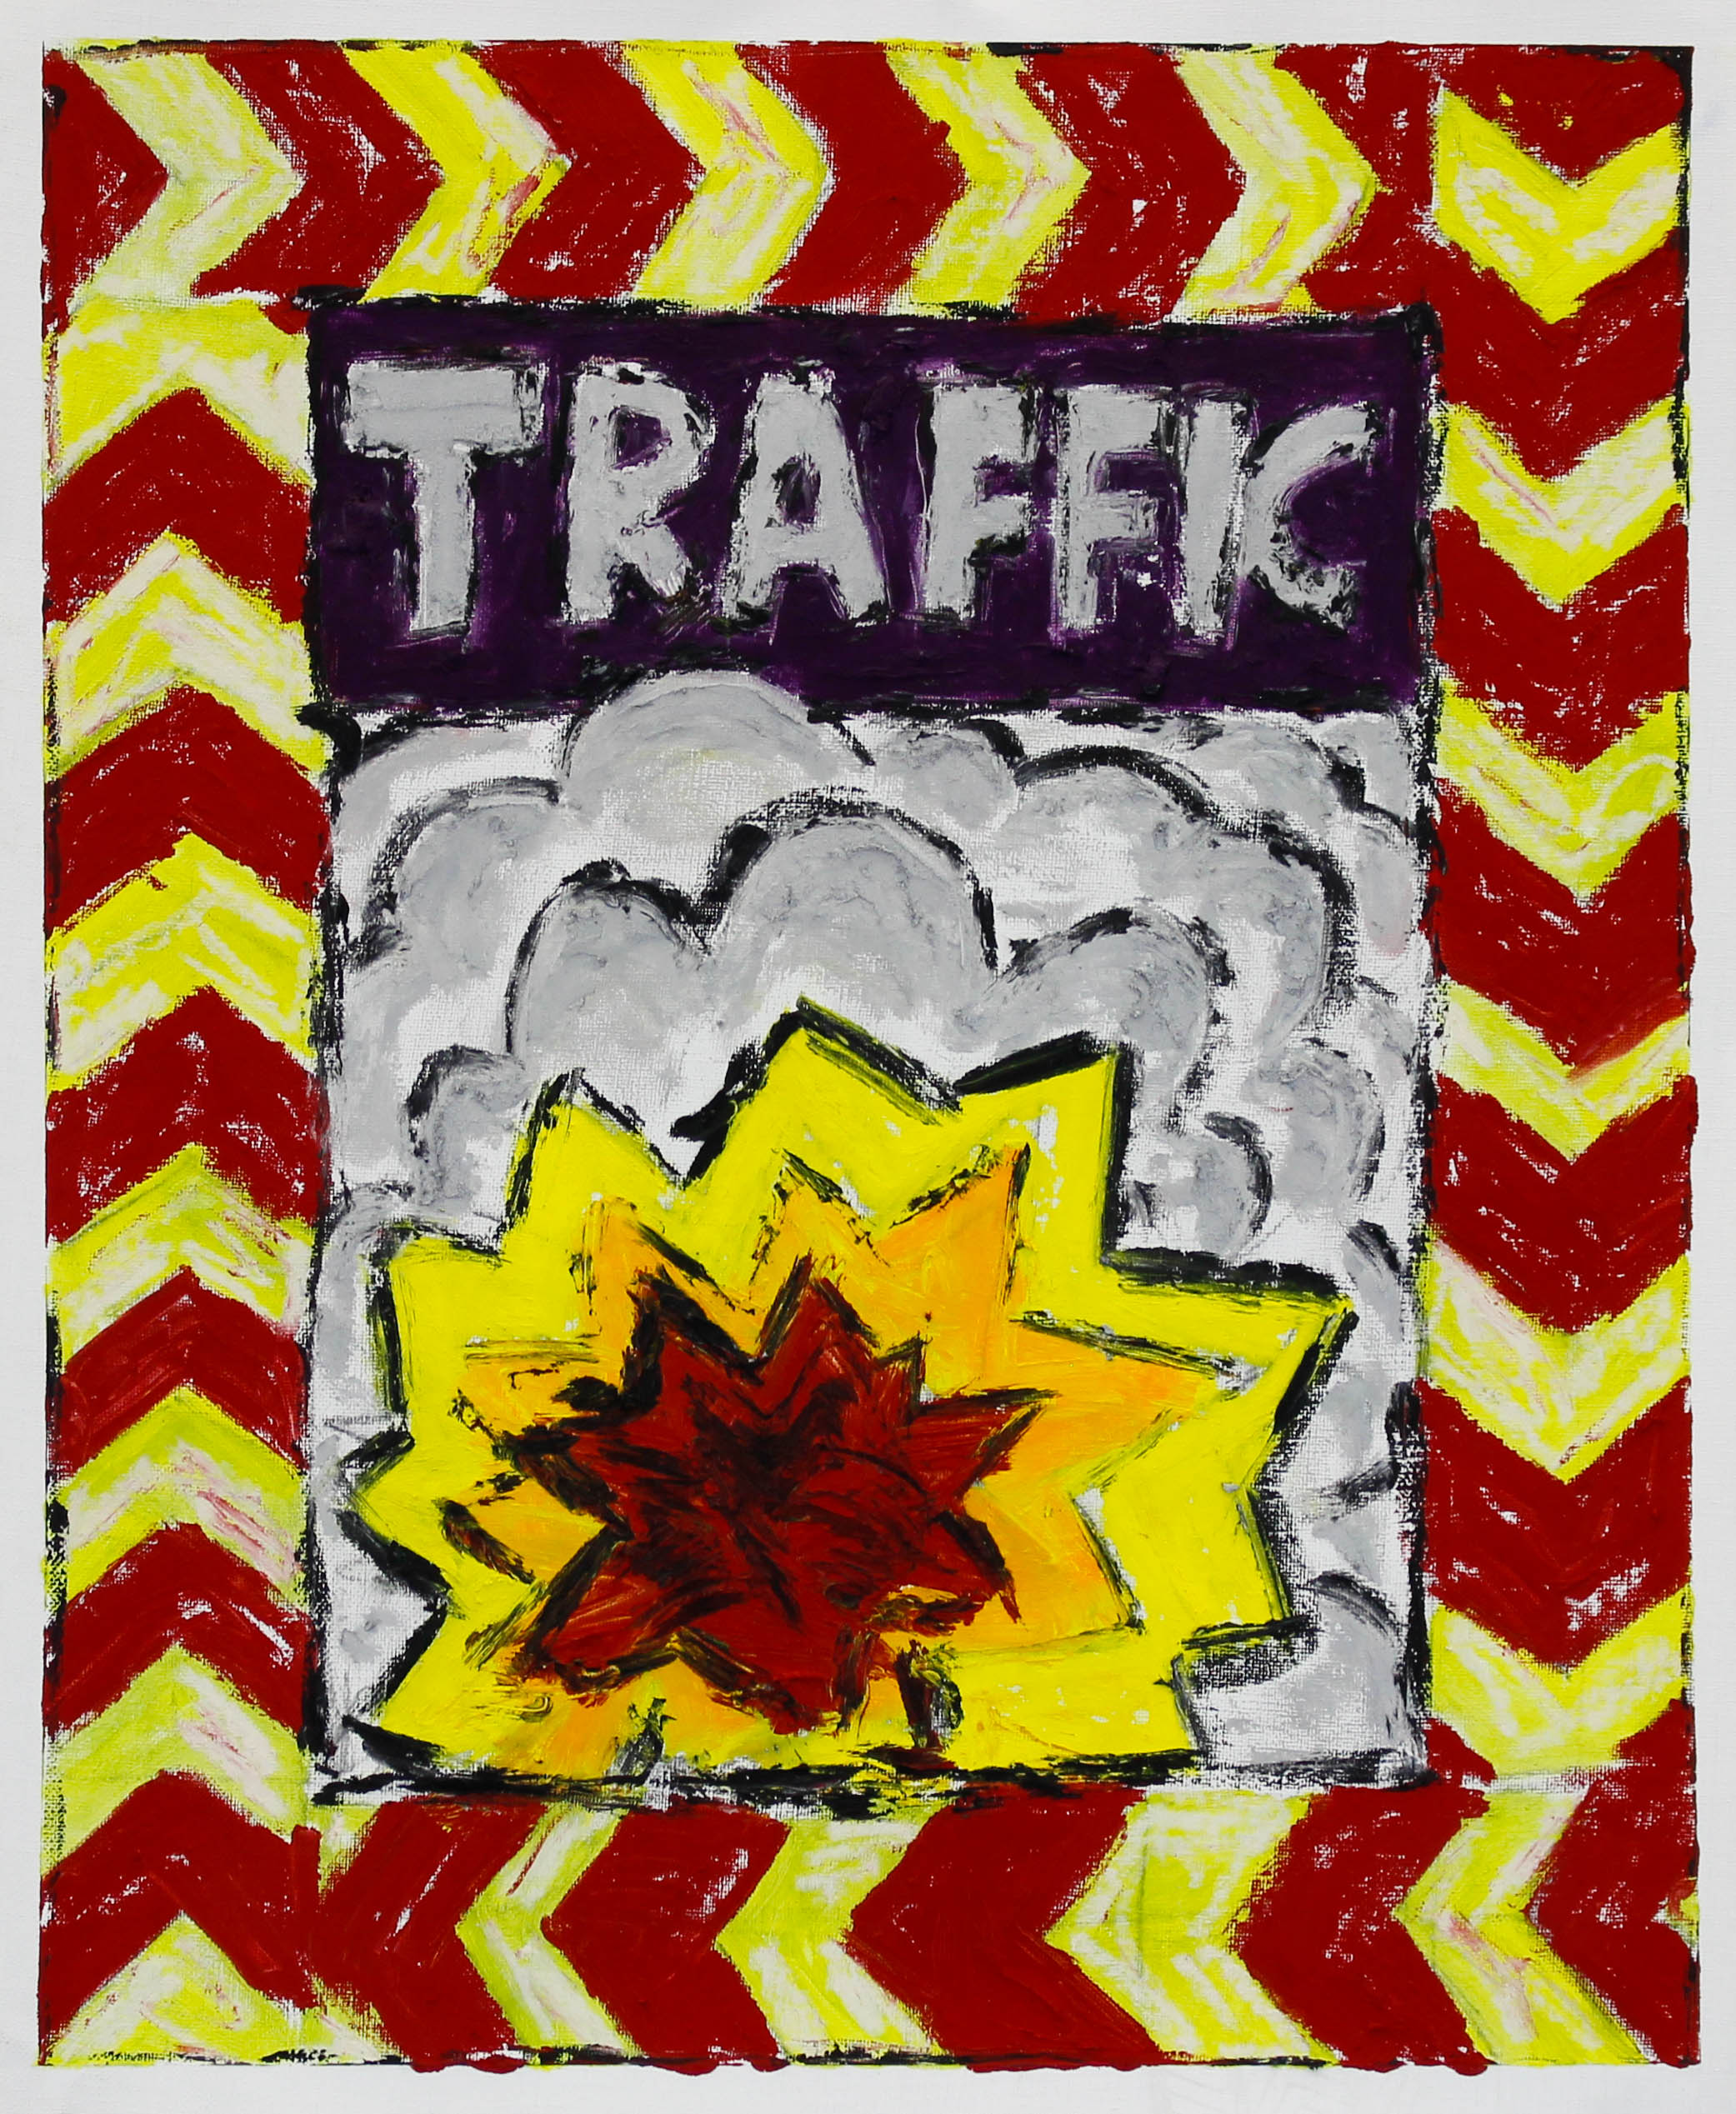 """TRAFFIC (WARNING)"" / 2019 OILSTICK ON UNSTRETCHED CANVAS FRAMED IN BLACK WITH ARTGLASS AR70 42 X 51 CM 4900 NOK"